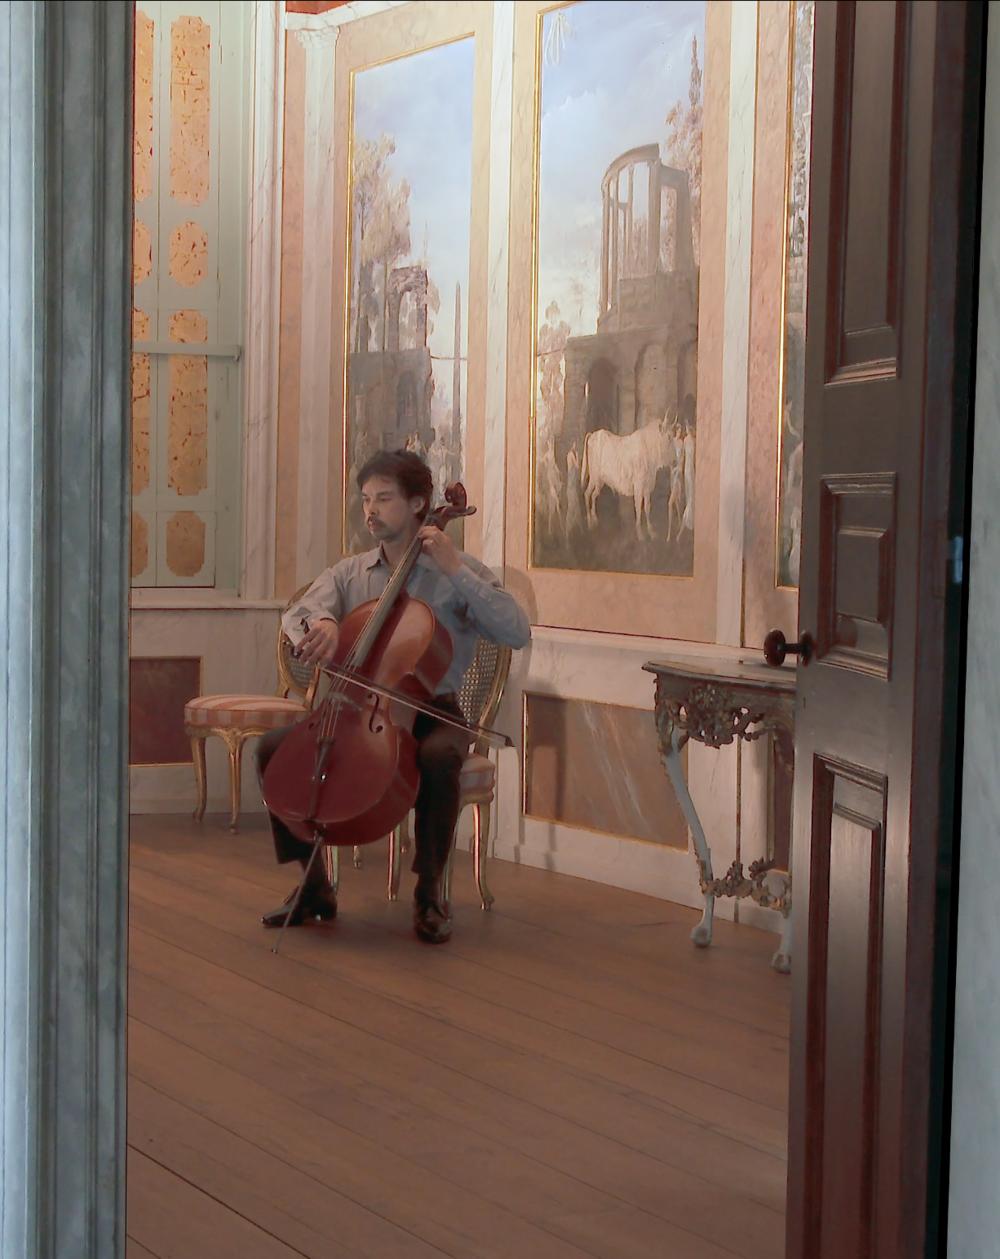 'Cello-Chelo-Violoncello-Fantasia-for-Cello-Alone-Richard-Gwilt-gut-strings-Detmar-Leertouwer-Dominus-Maris-Music-Productions-Tanja-Brandon-Bach-in-Castles-Bach-in-Burchten-Bach-in-Burgen-Bach-en-Castillos-Arcus-Bows-Charles-Riché-Baroque-Cello.png